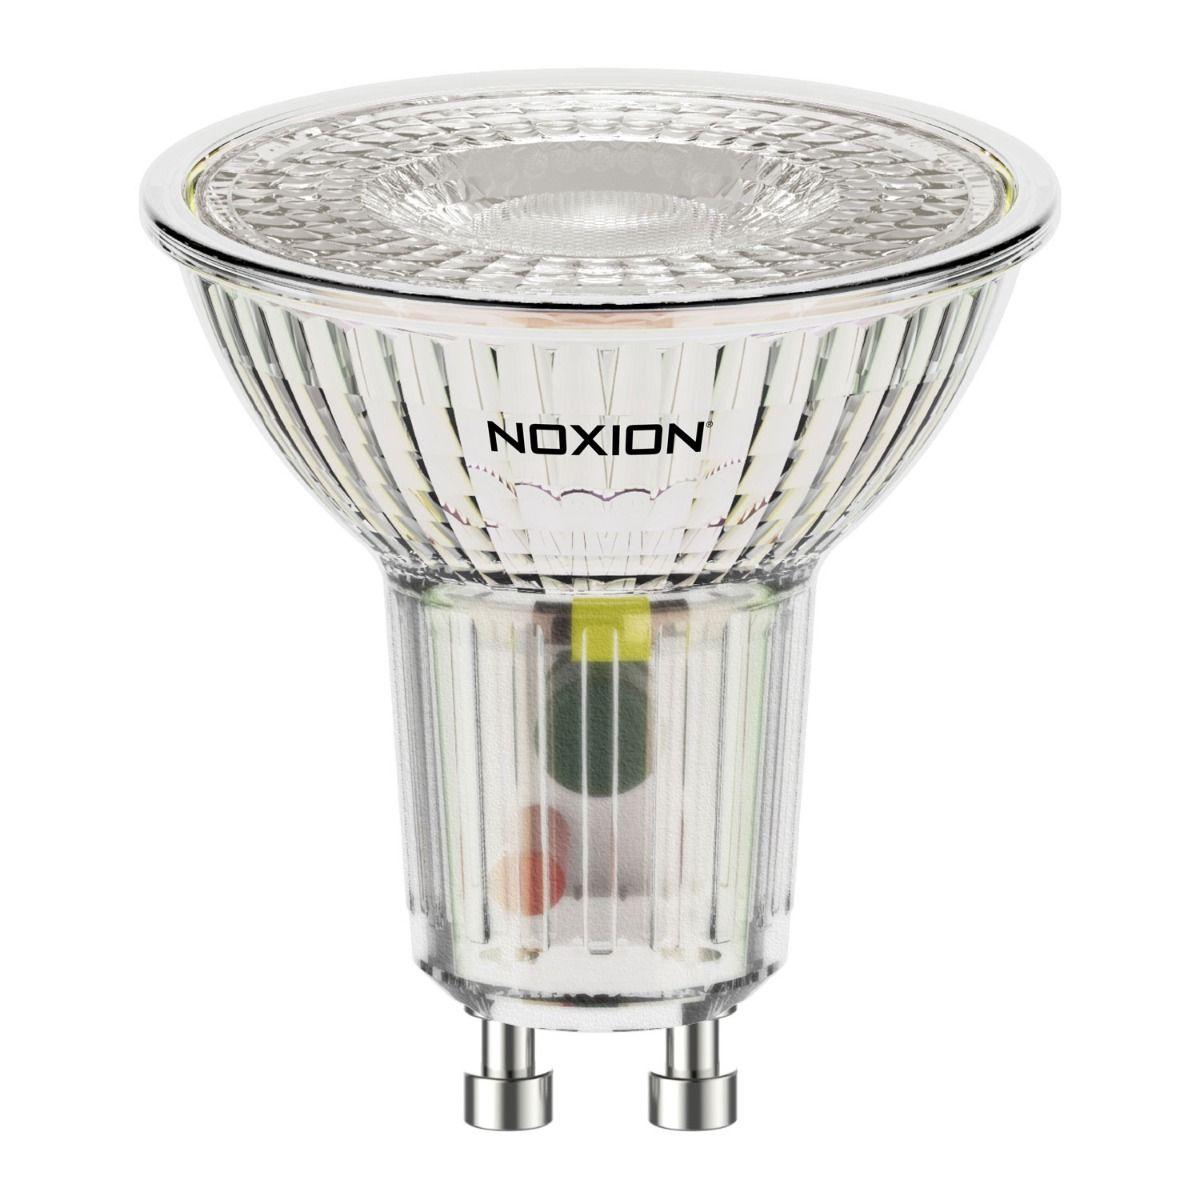 Noxion LED Spot GU10 3.7W 830 36D 260lm | Replacer for 35W